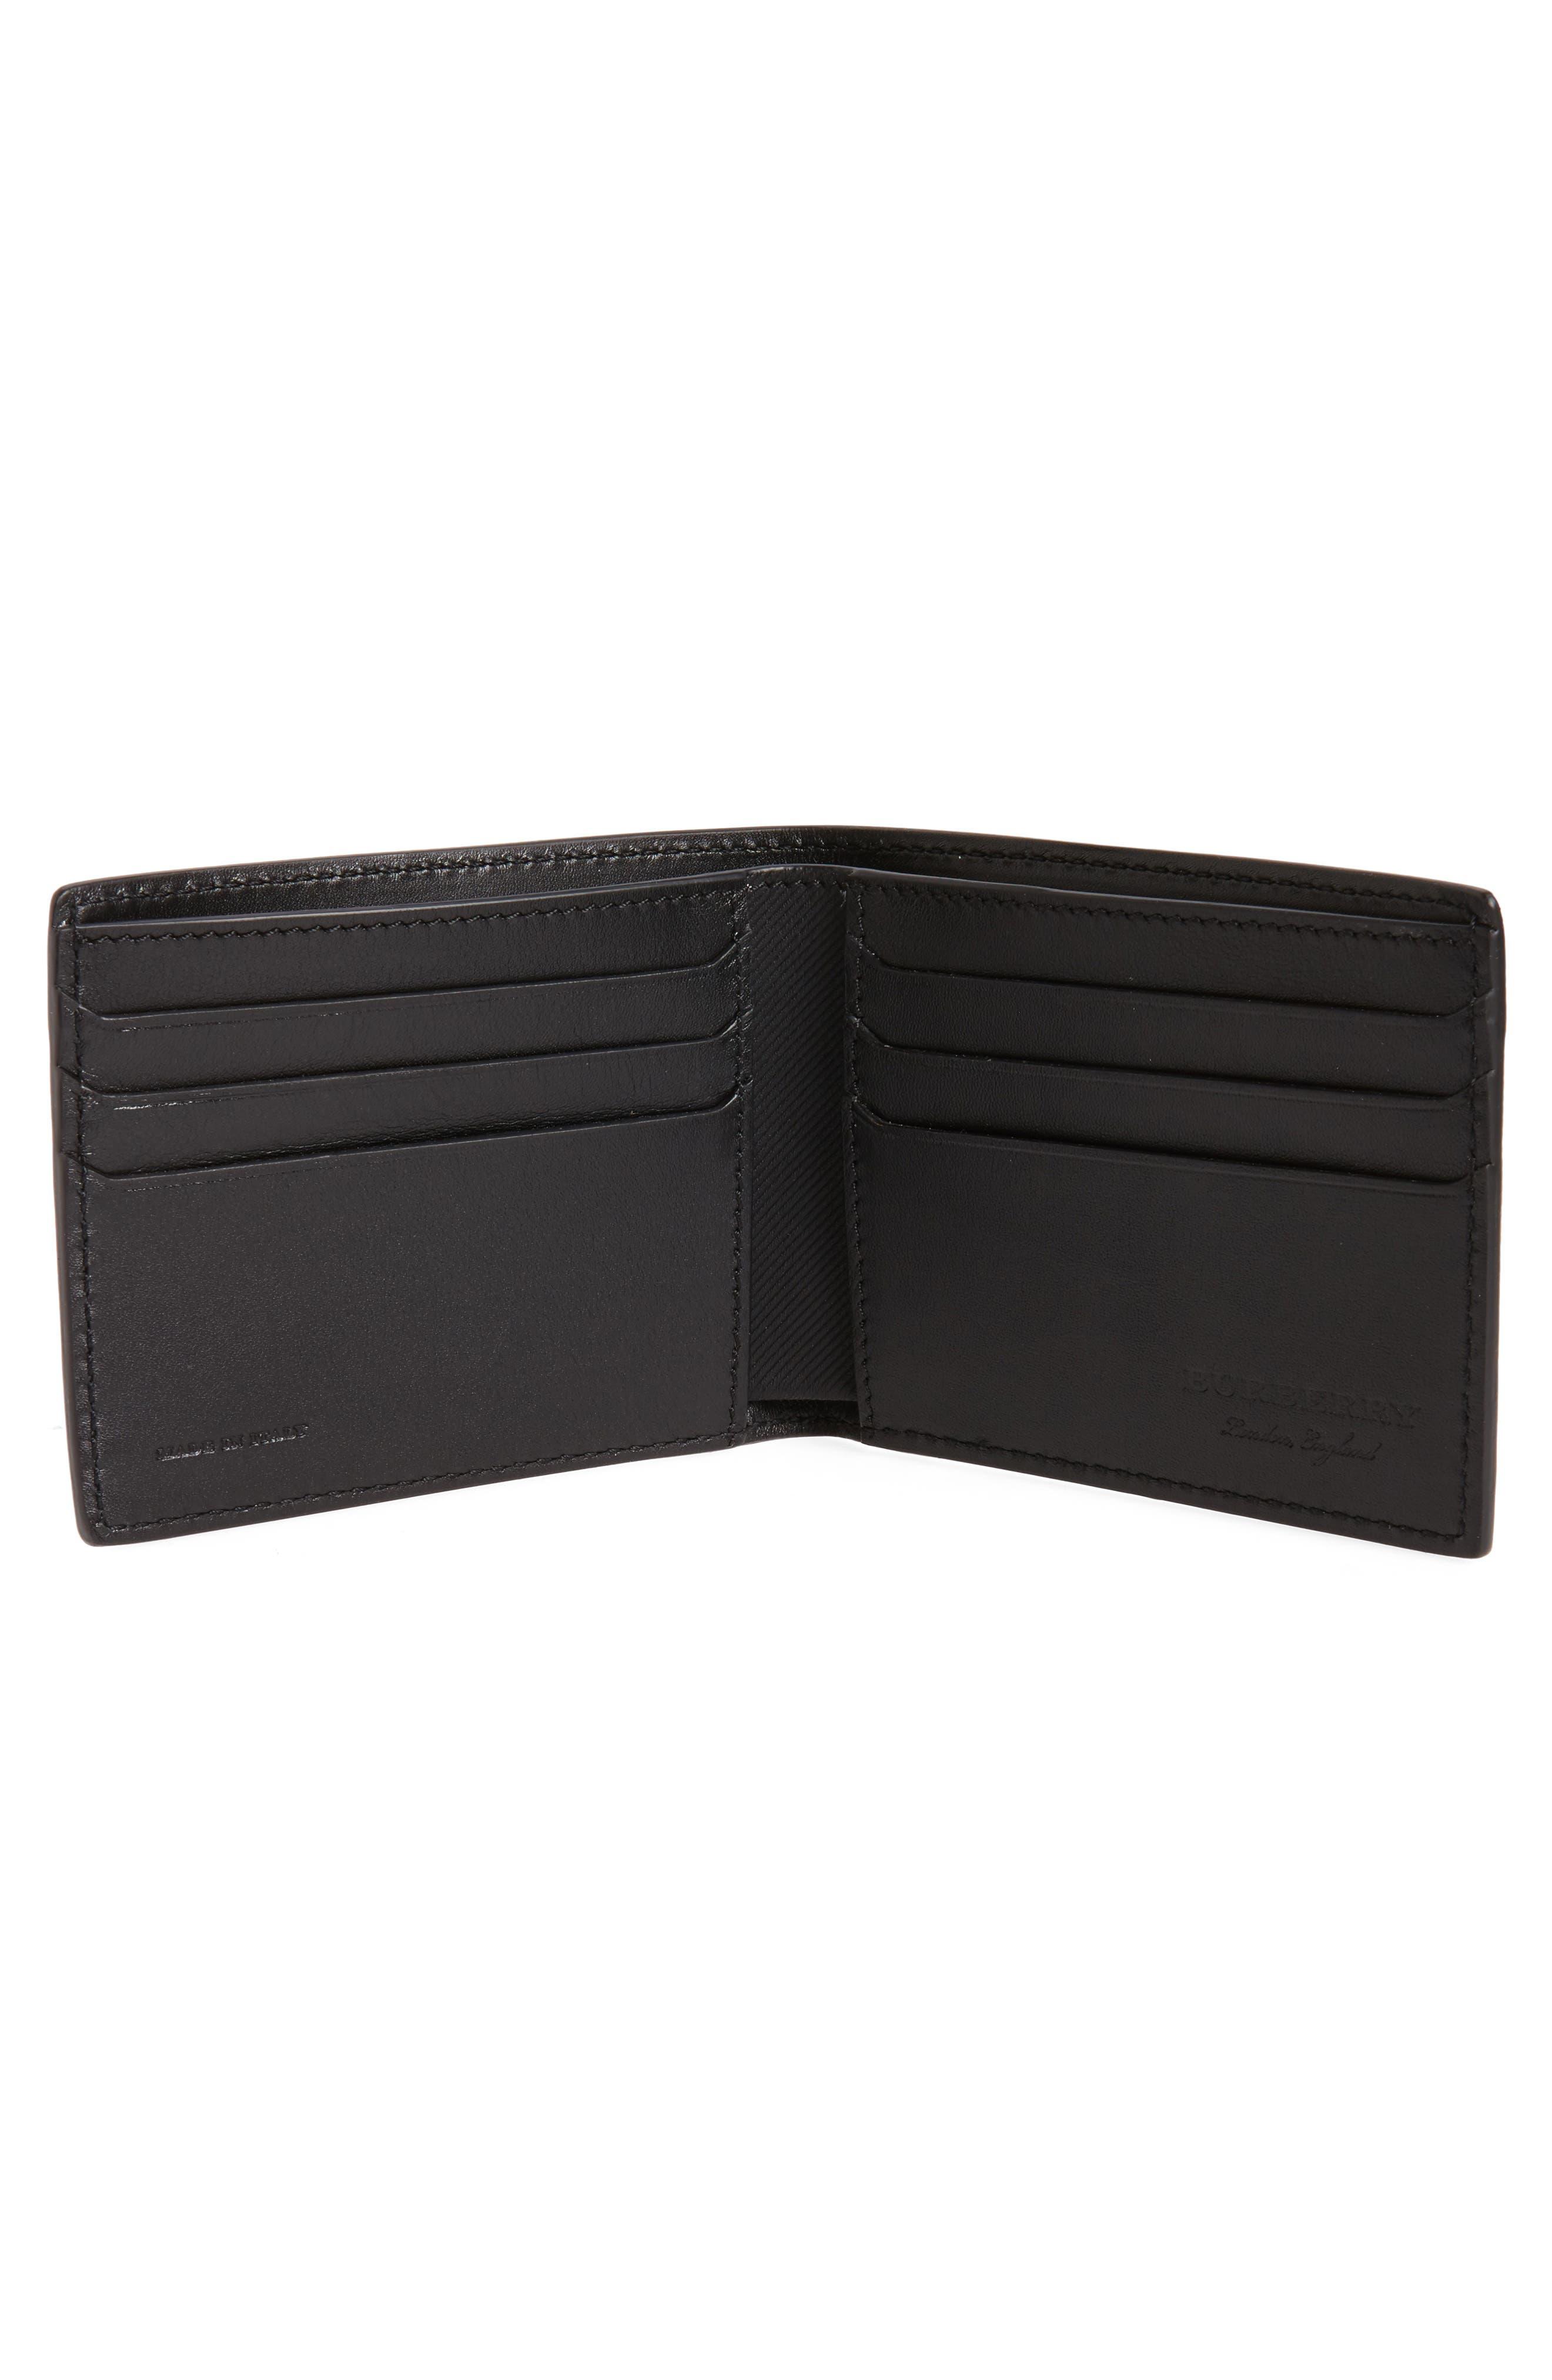 Leather Bifold Wallet,                             Alternate thumbnail 2, color,                             Black